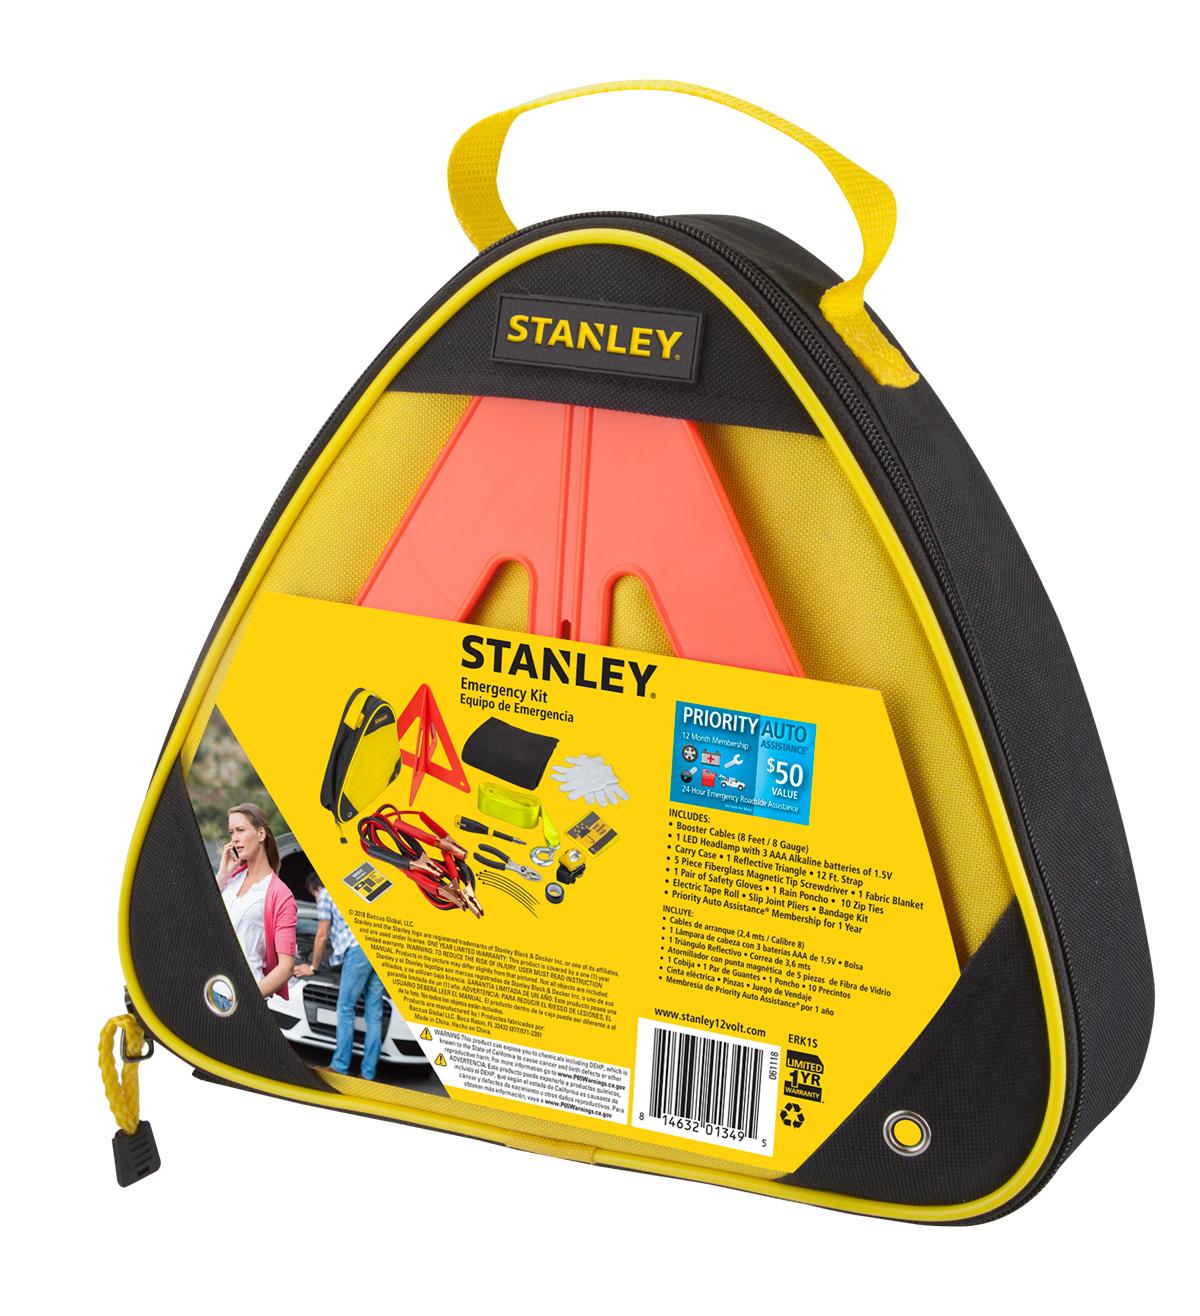 Stanley ERK1S Emergency Roadside kit with Jumper Cables $5 Walmart B&M YMMV